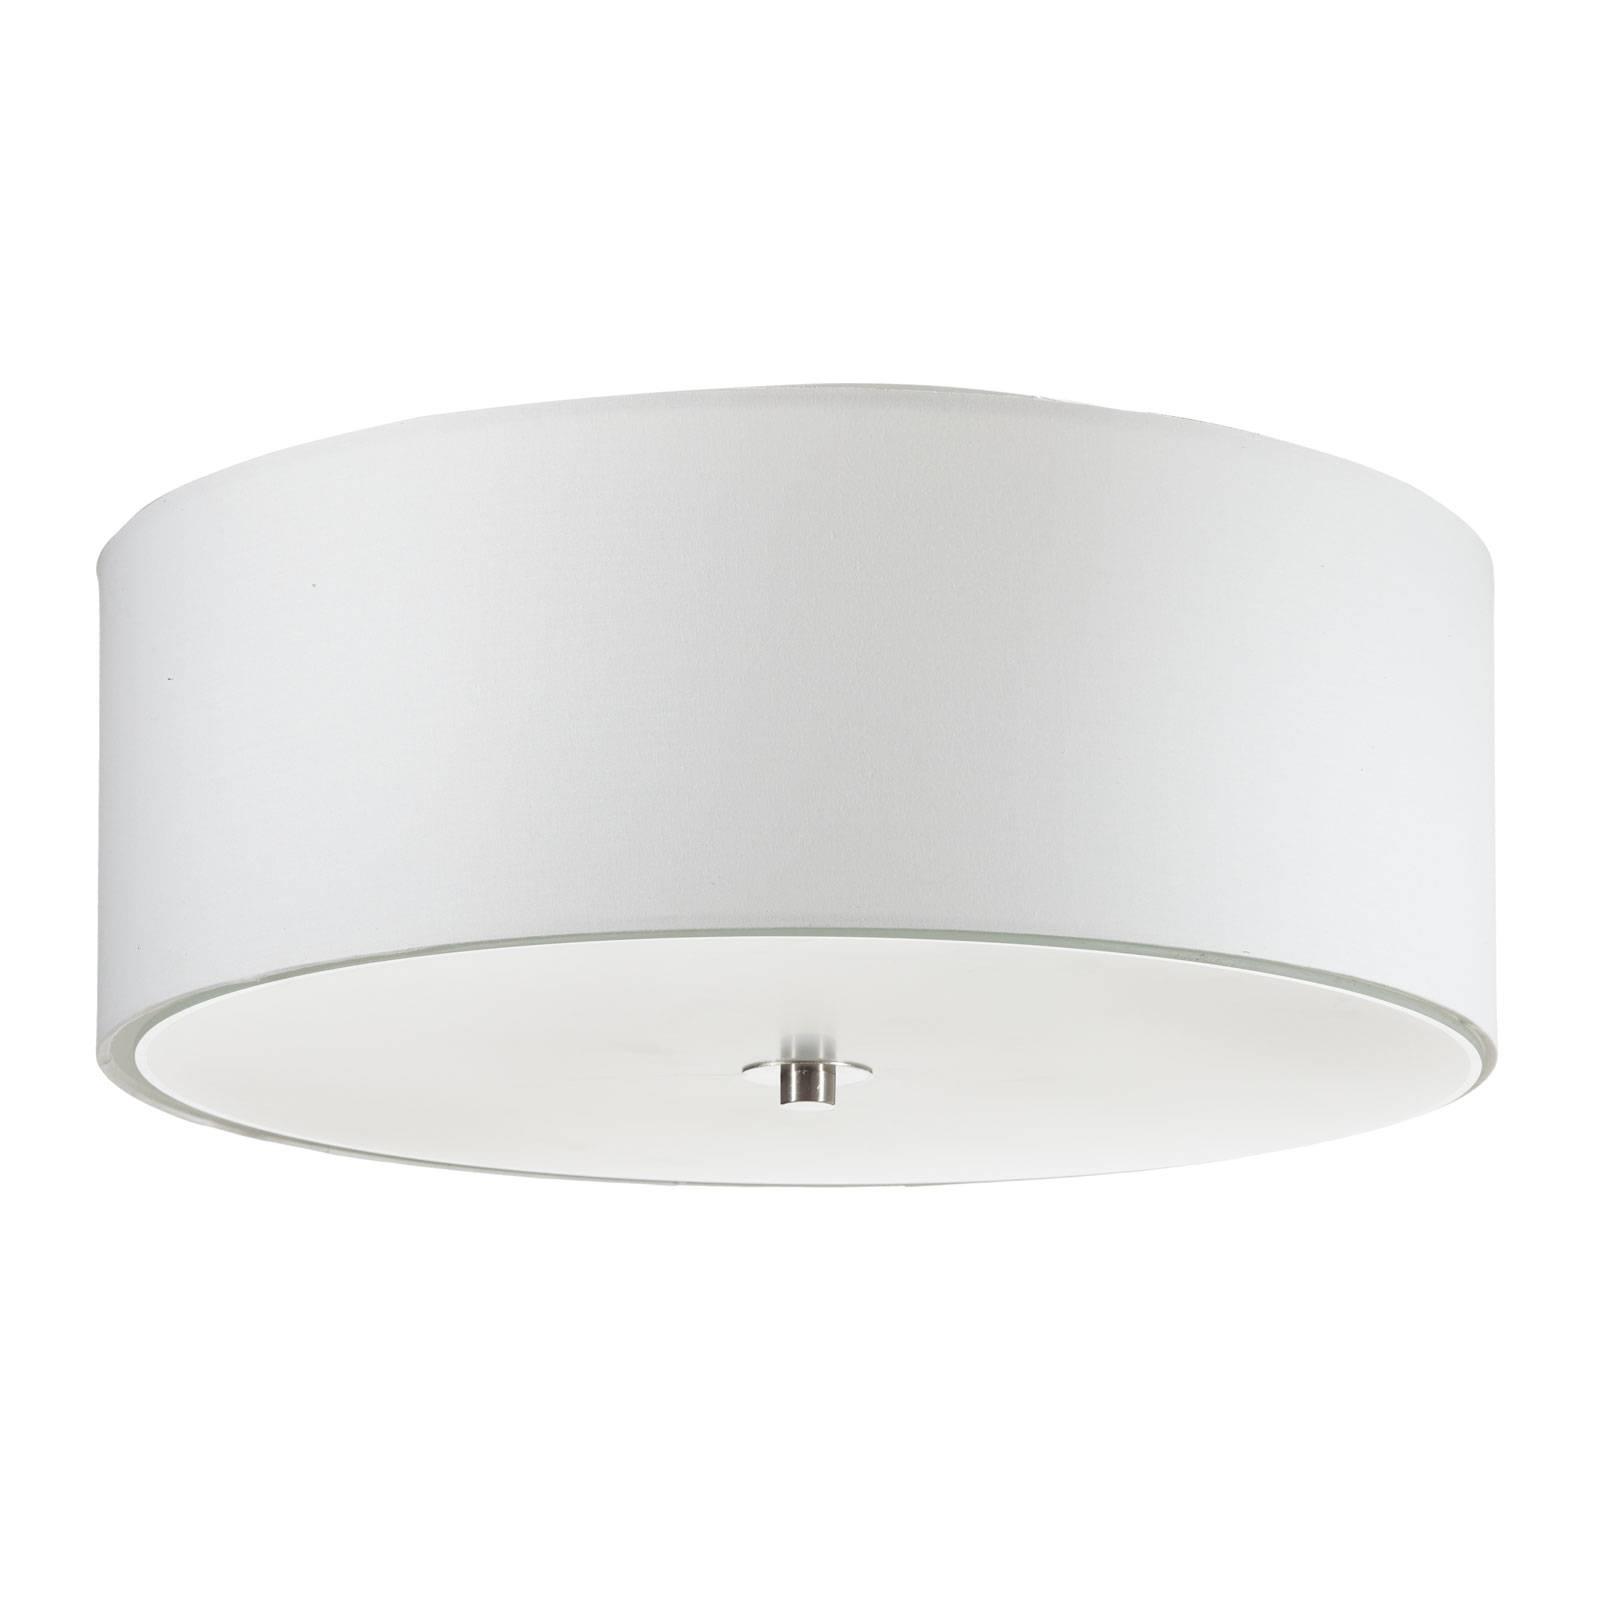 Lucande Patrik lampa sufitowa Ø48cm biała